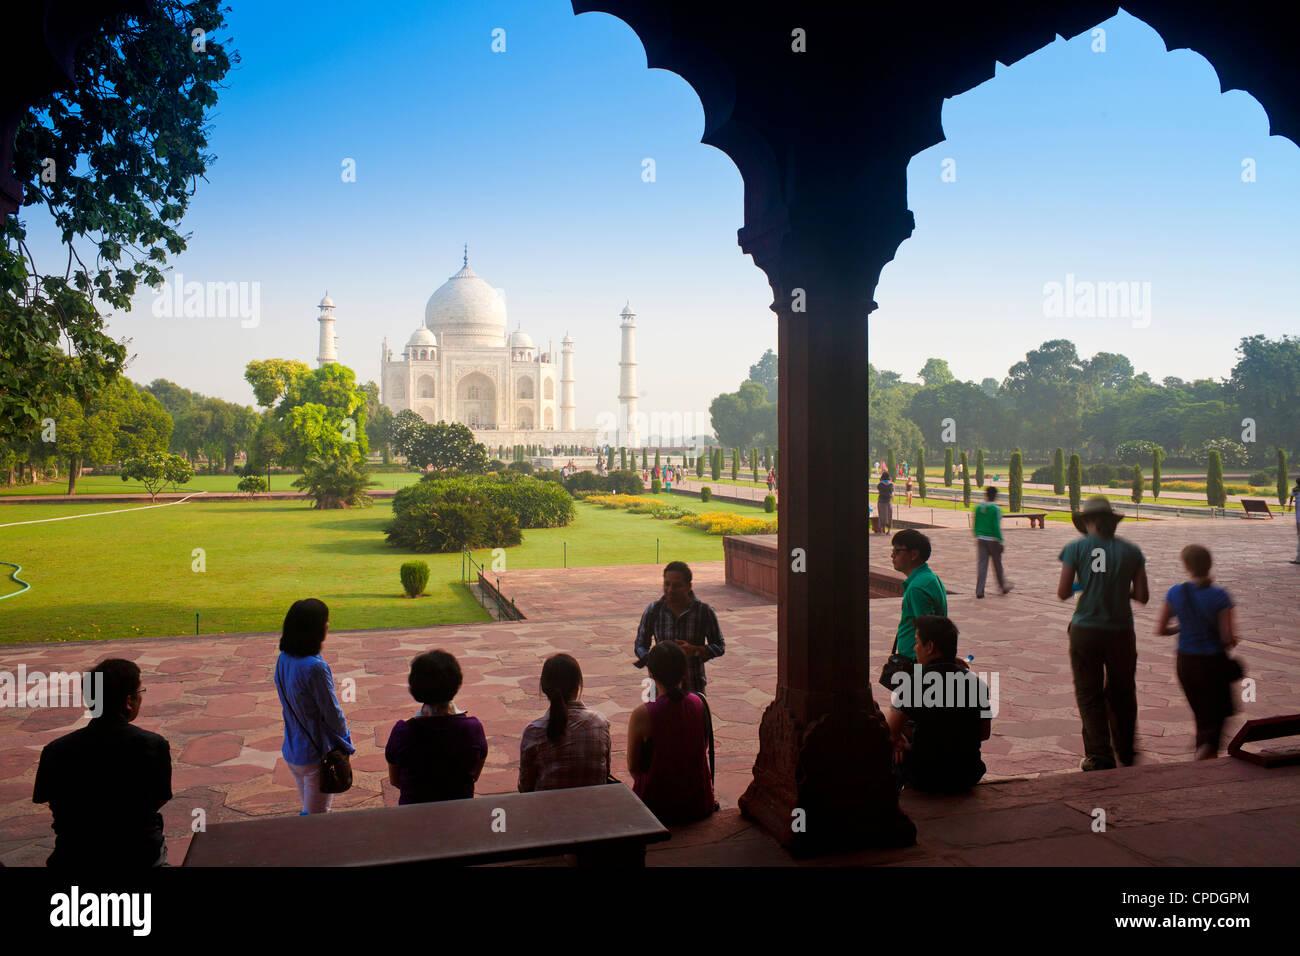 Taj Mahal, UNESCO World Heritage Site, viewed through decorative stone archway, Agra, Uttar Pradesh state, India, - Stock Image